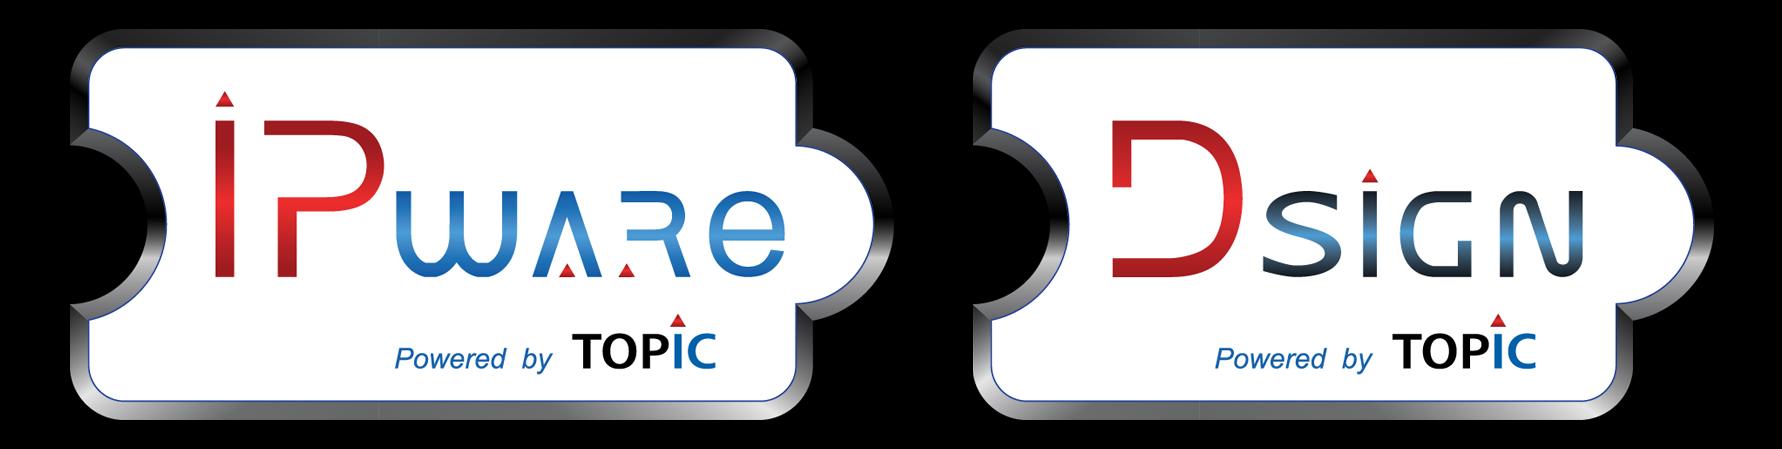 IPware + Dsign logos